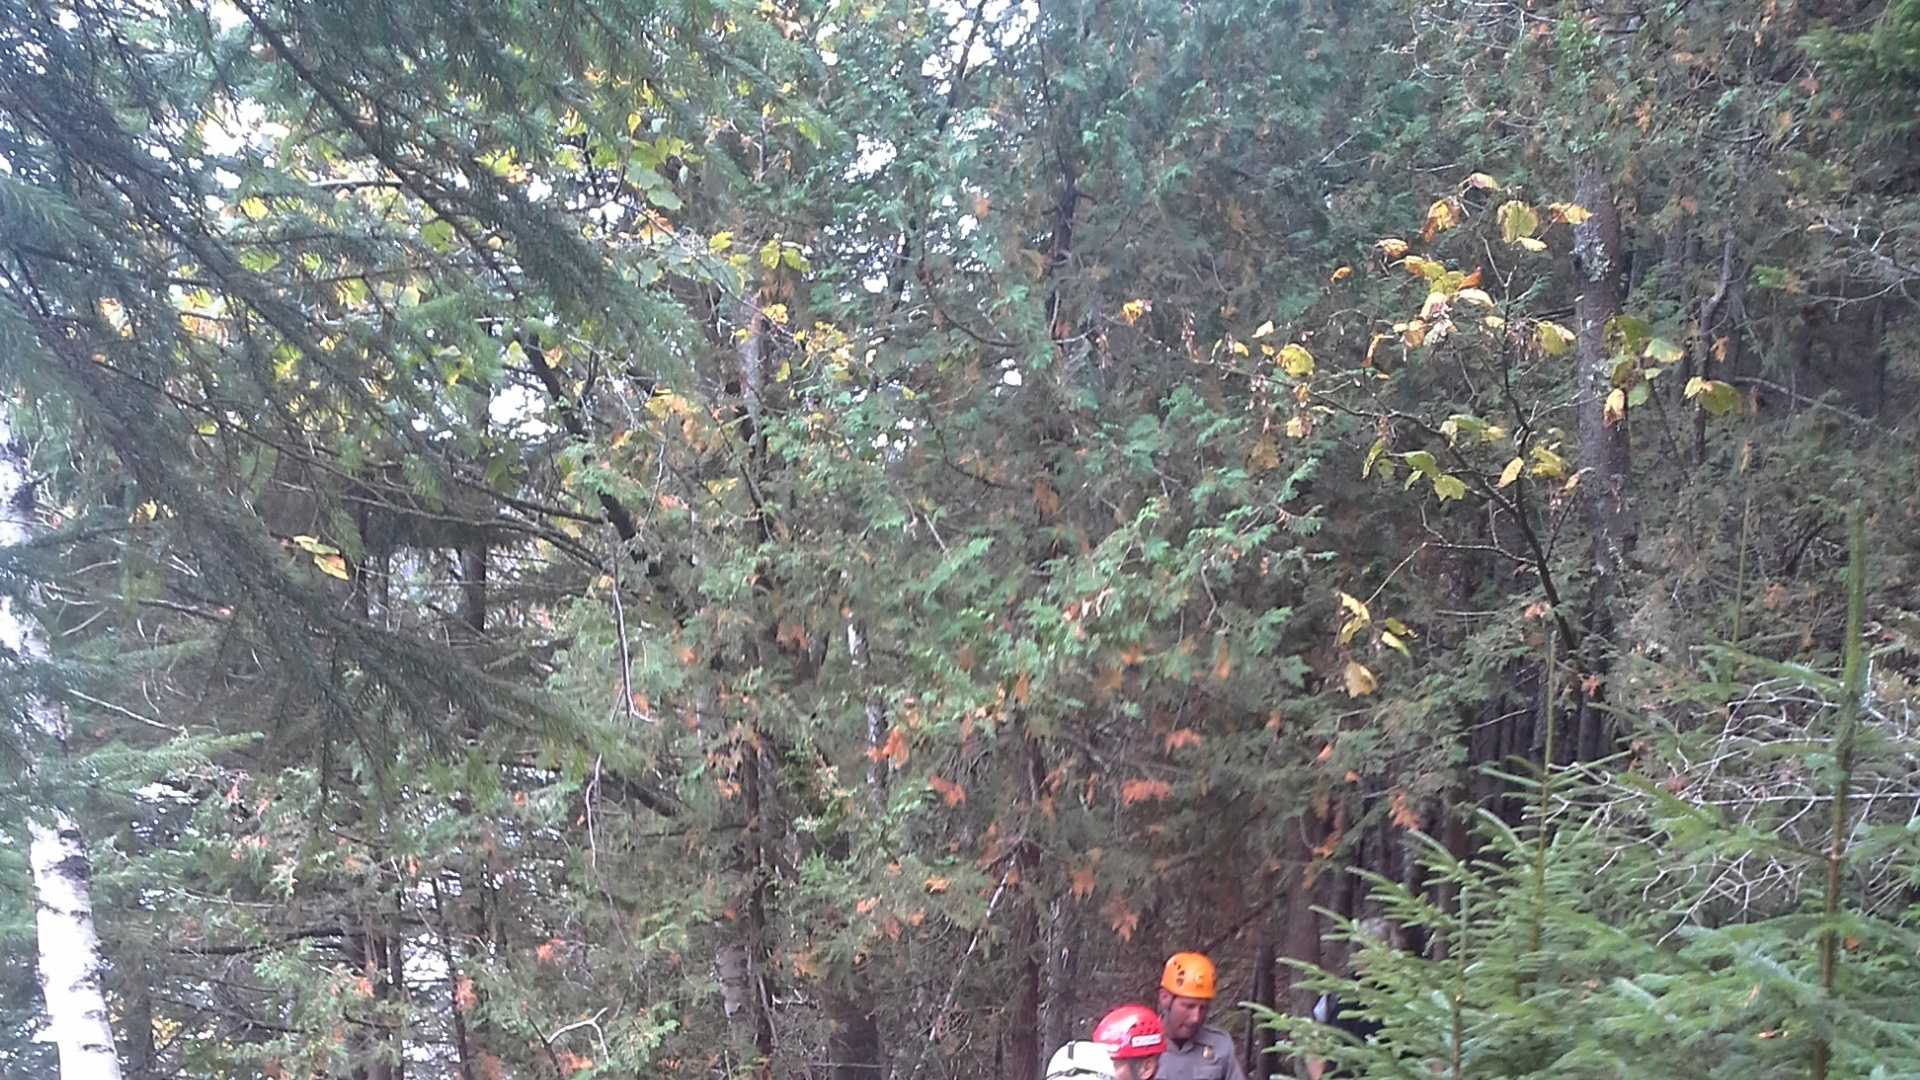 Acadia National Park rescue